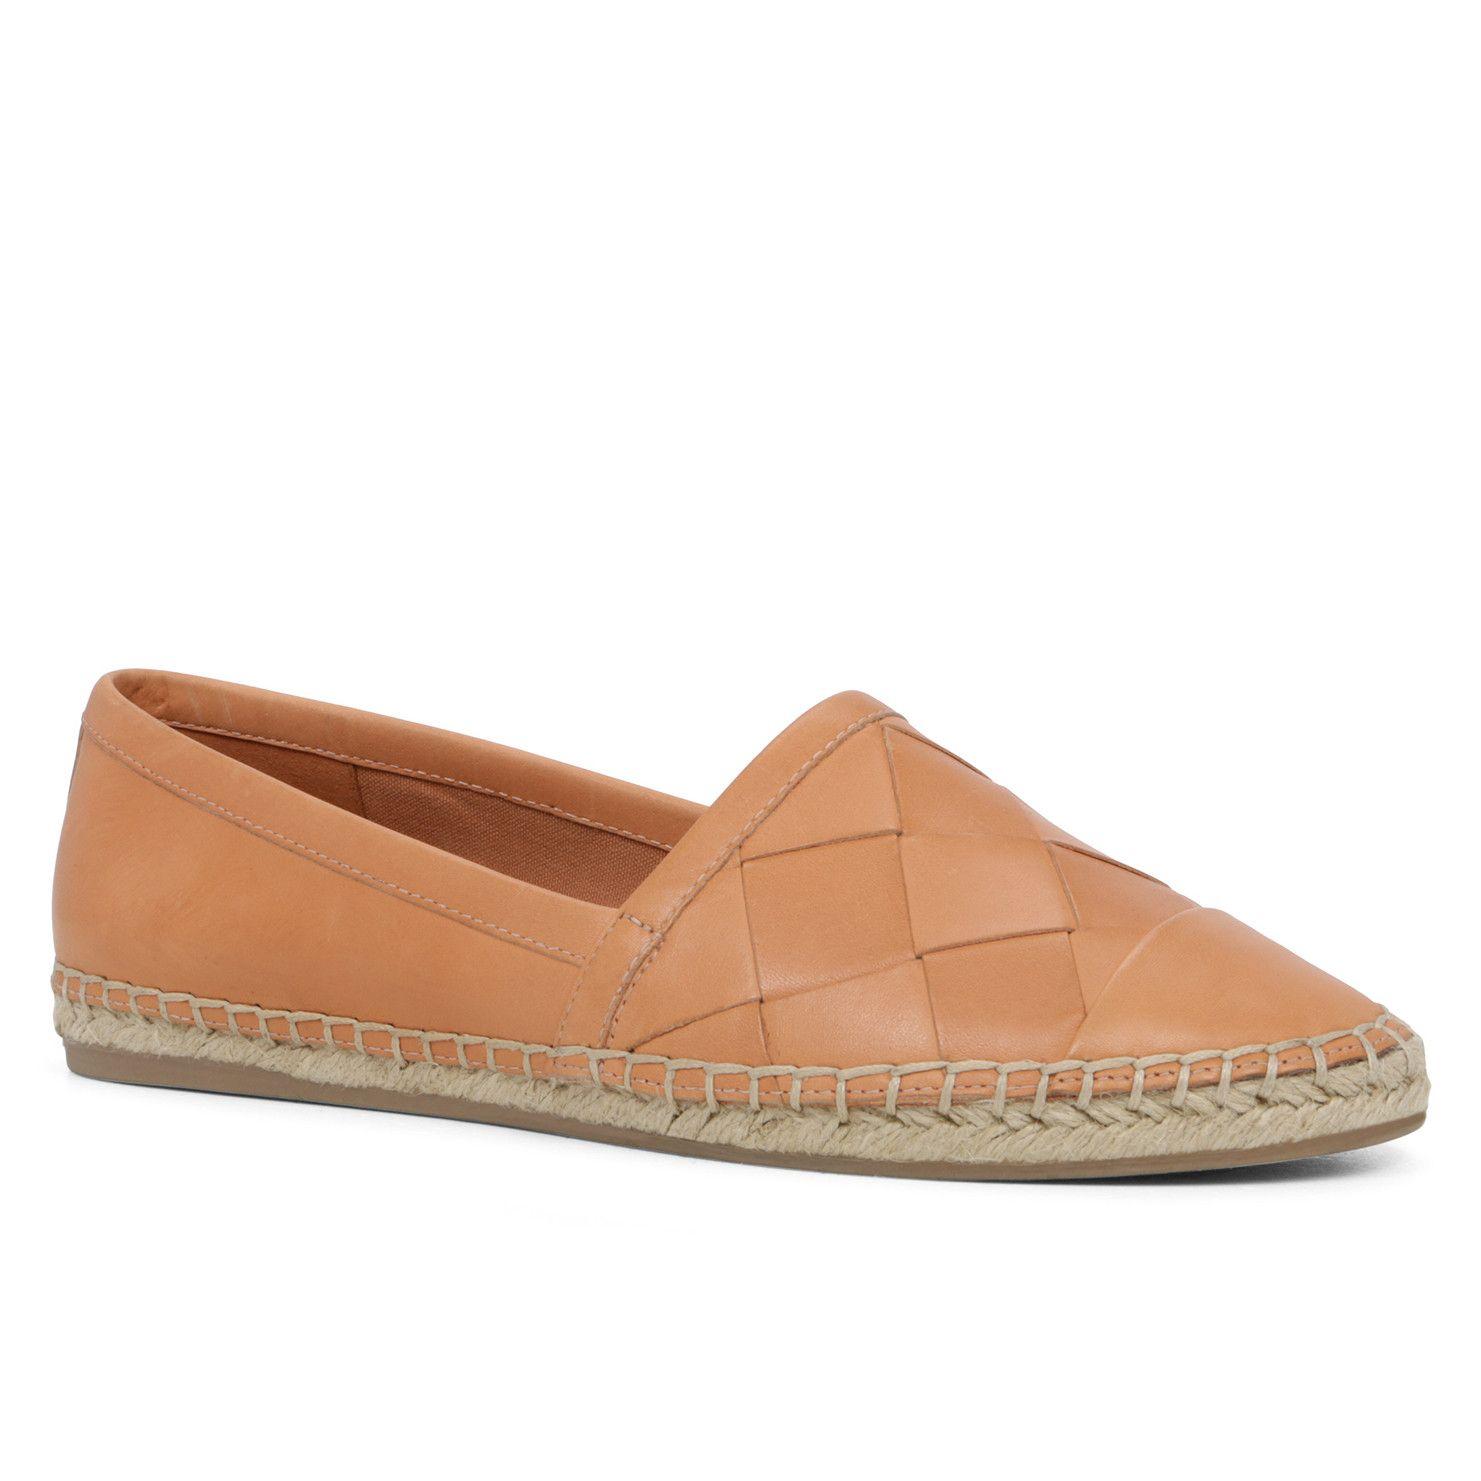 Explore Aldo Shoes, Women's Shoes and more!